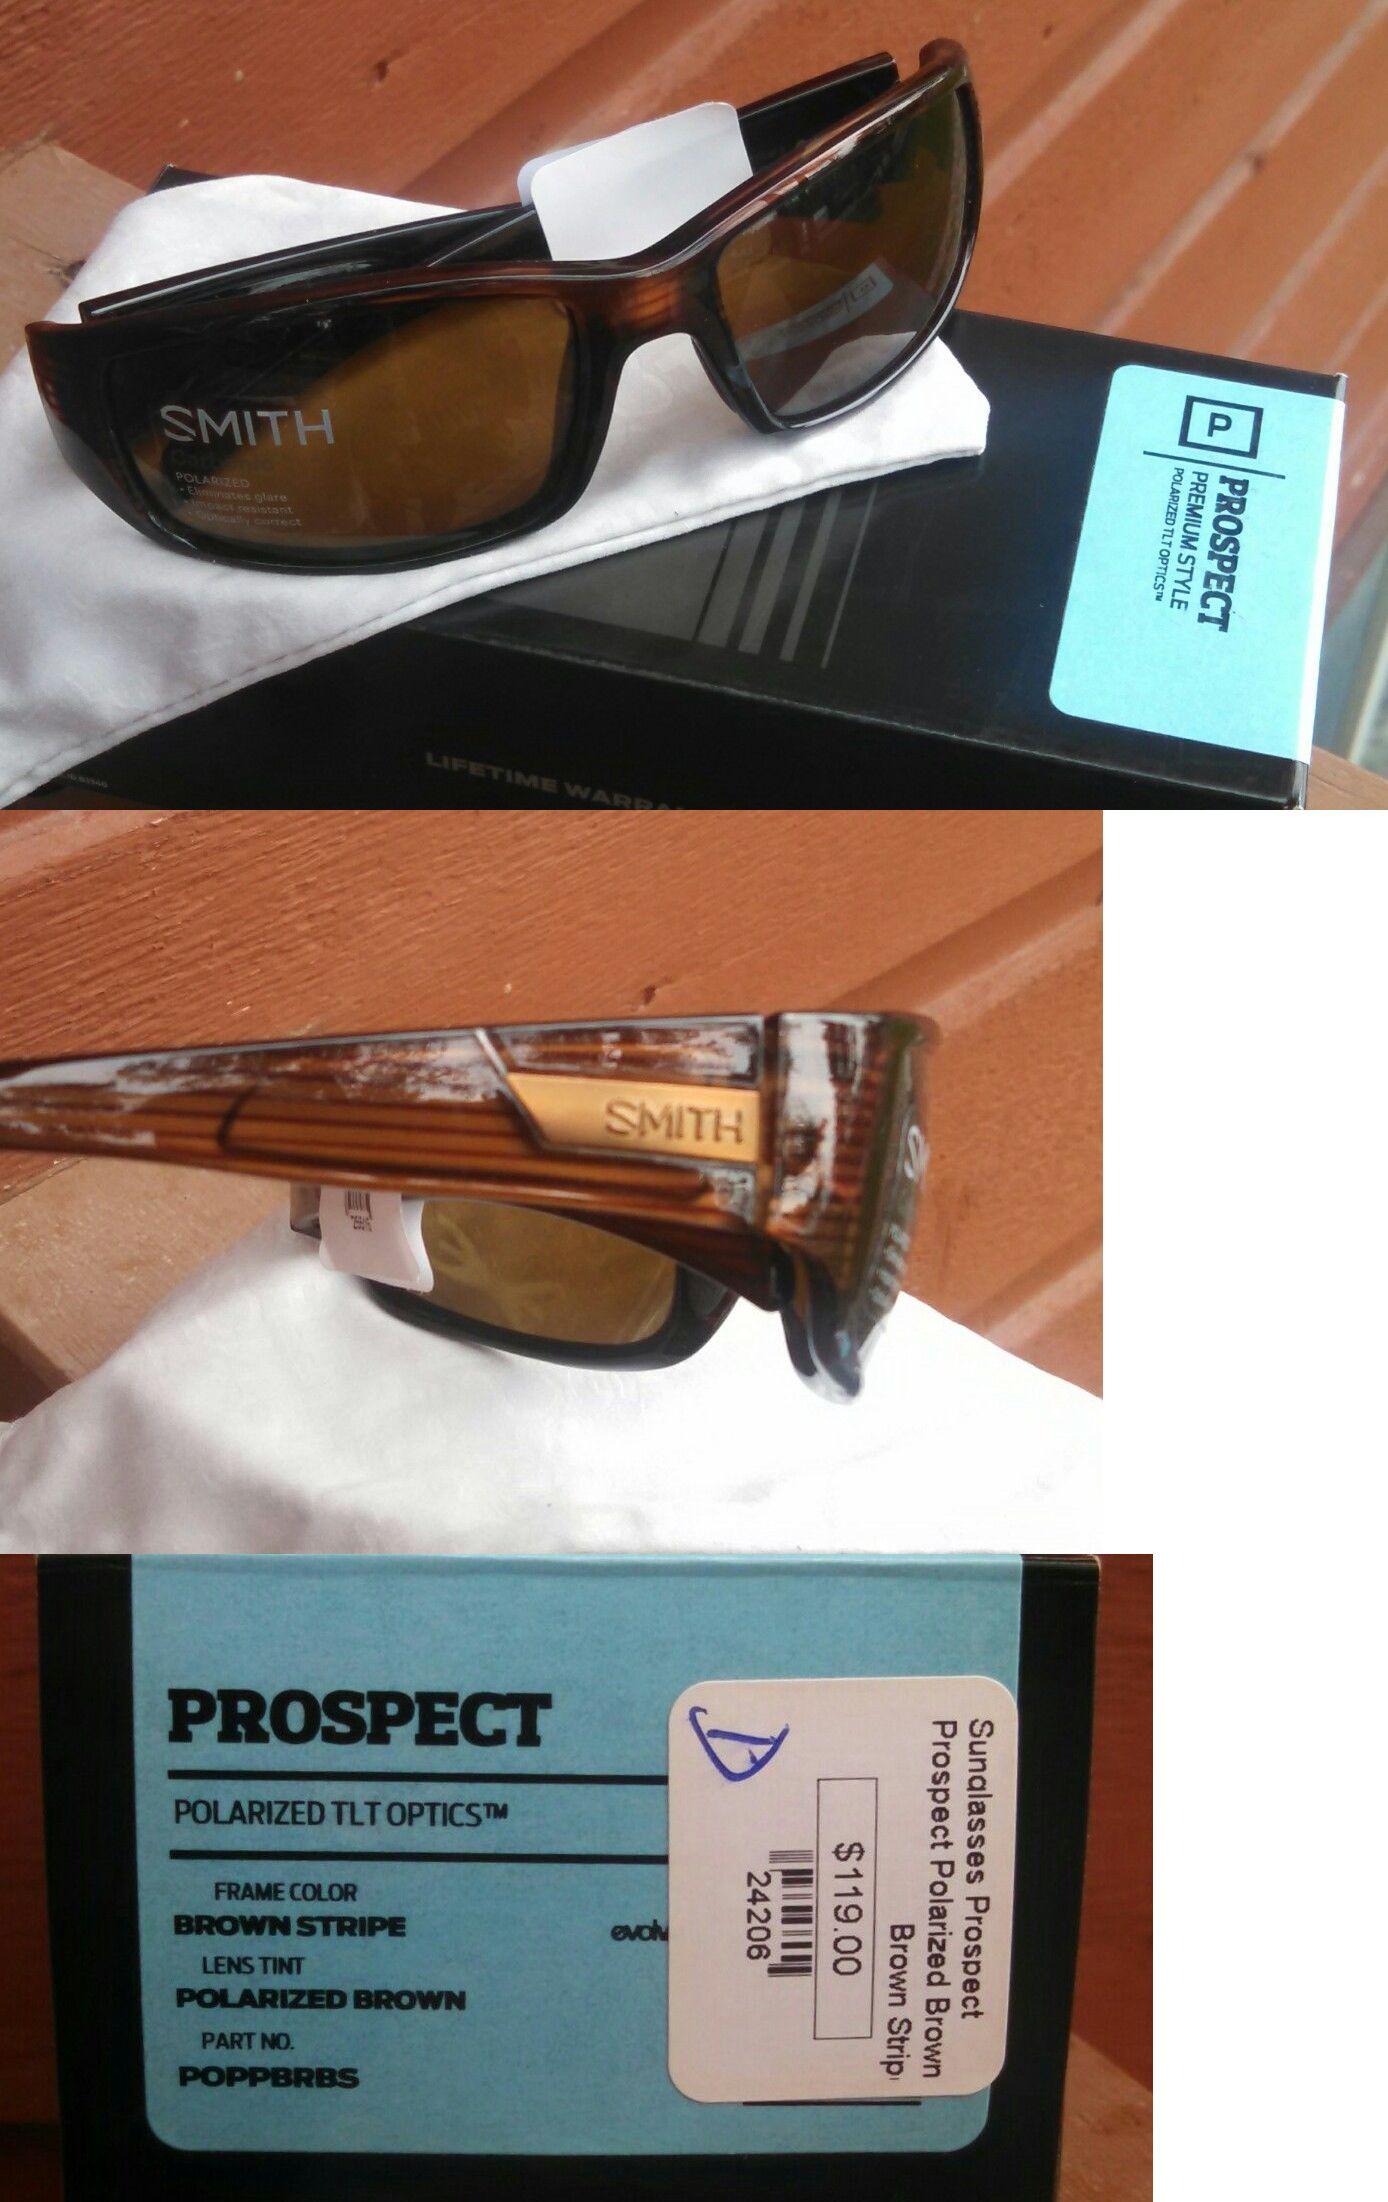 1f7897e105 Sunglasses and Goggles 56185  Smith Optics Prospect Sunglasses Polarized  Brown Carbonic Tlt Lenses -